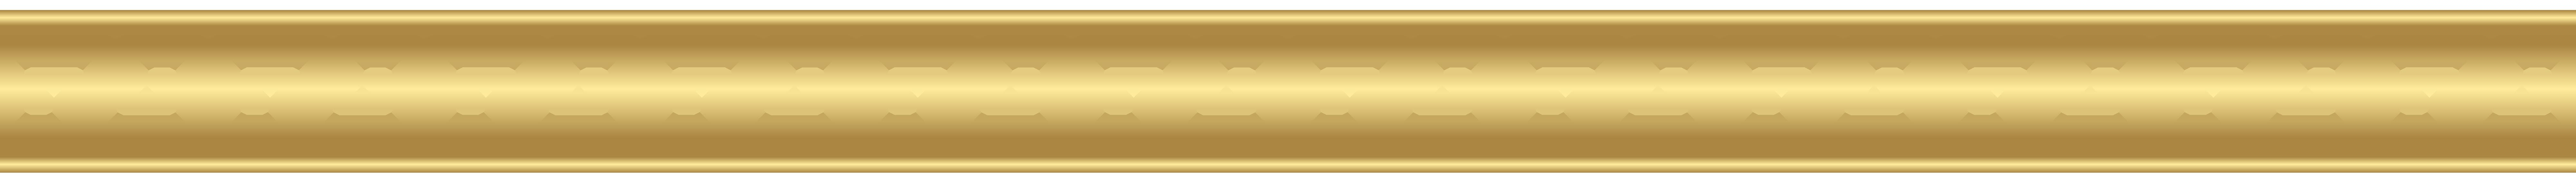 Greek clipart transparent. Gold decoration png clip